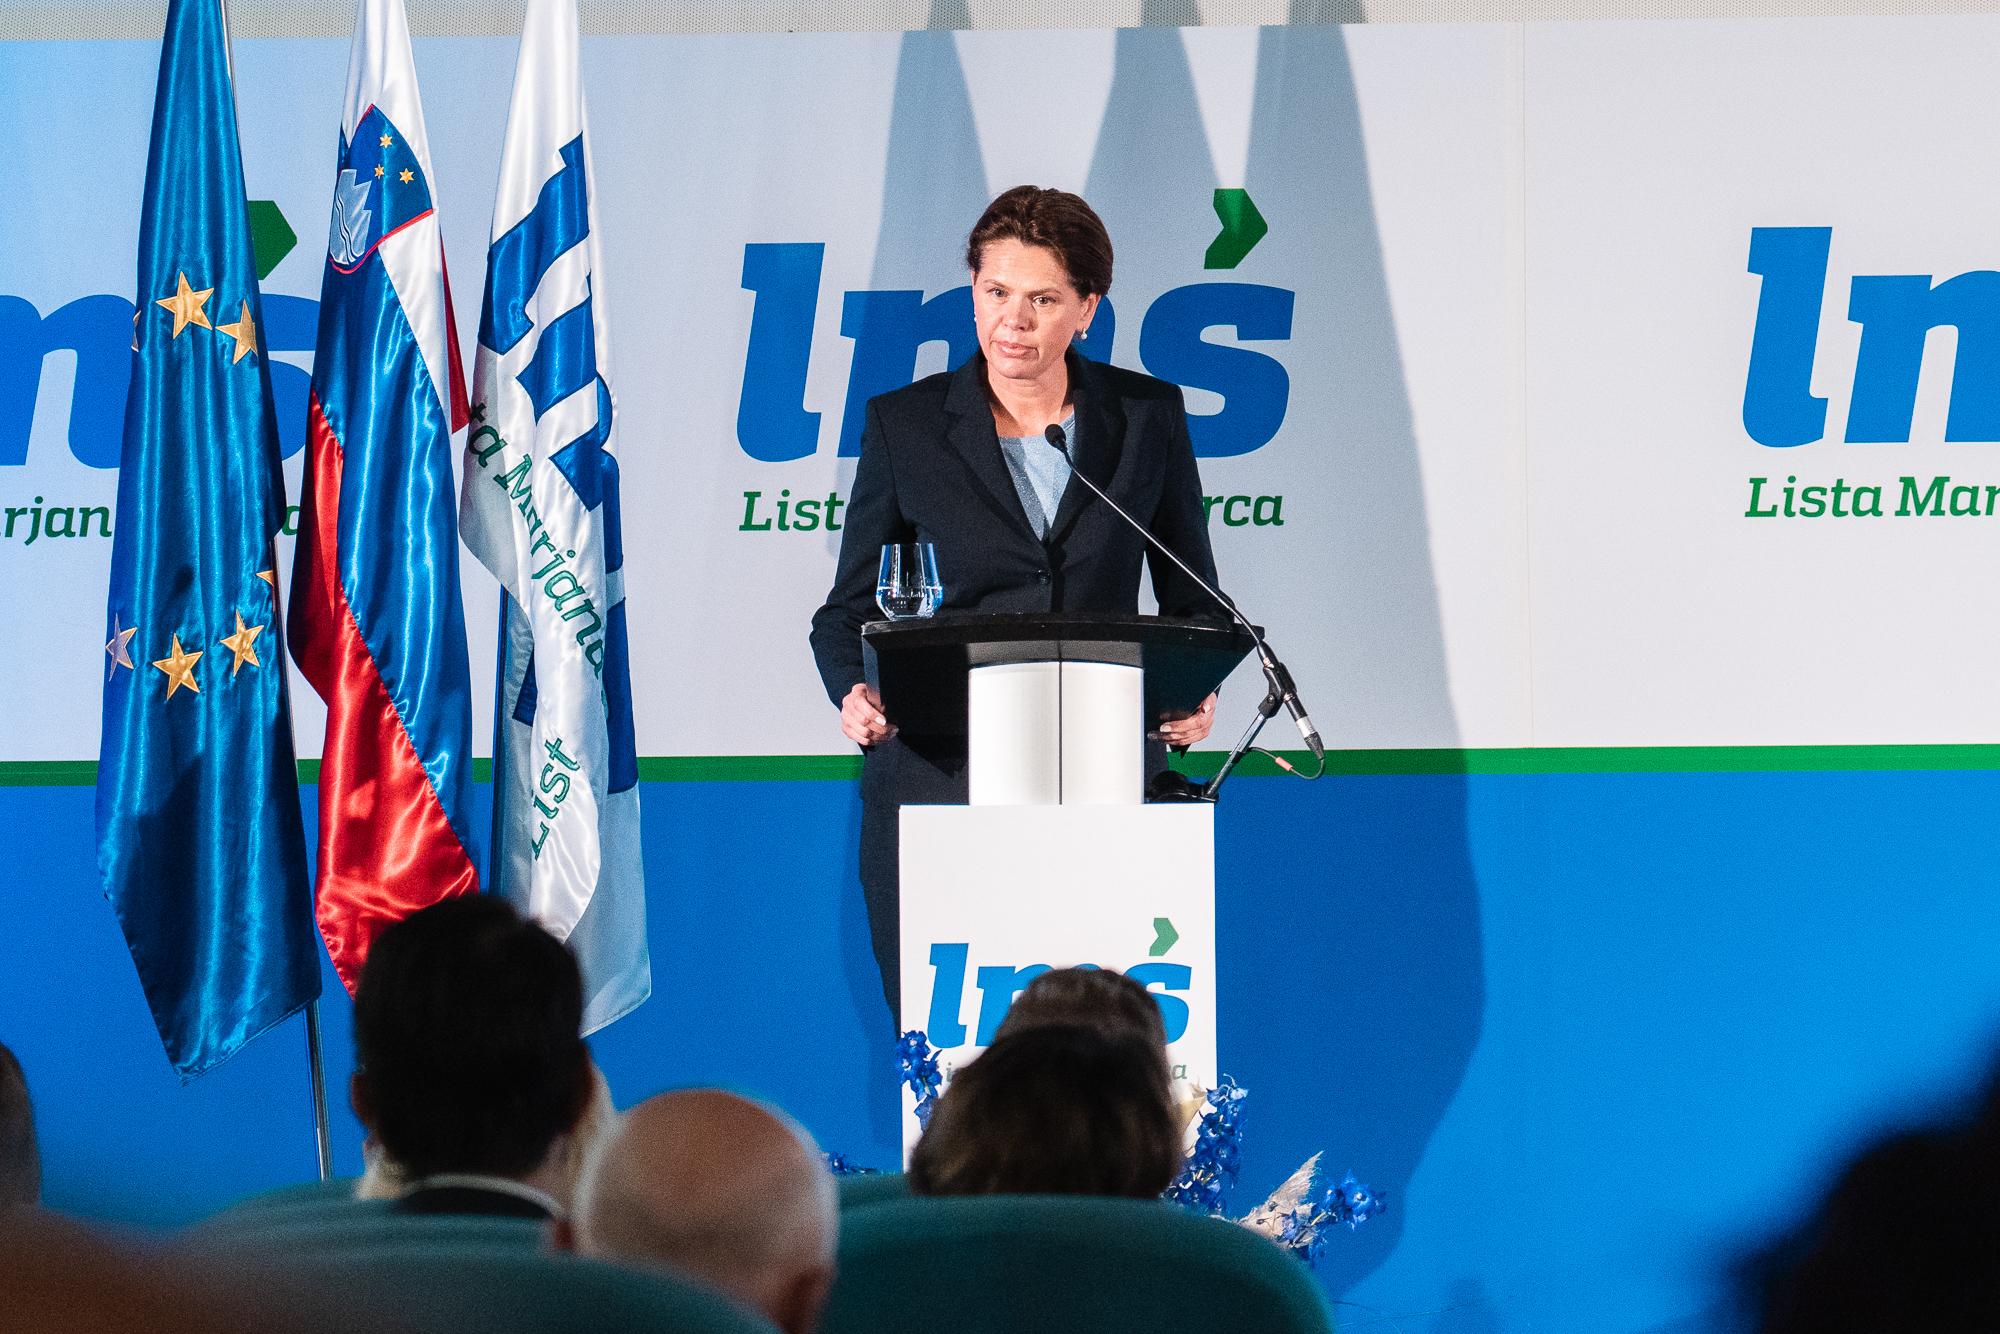 Alenka Bratušek, president of Alenka Bratušek Party, on the stage at the Fifth Congress of Lista Marjana Šarca